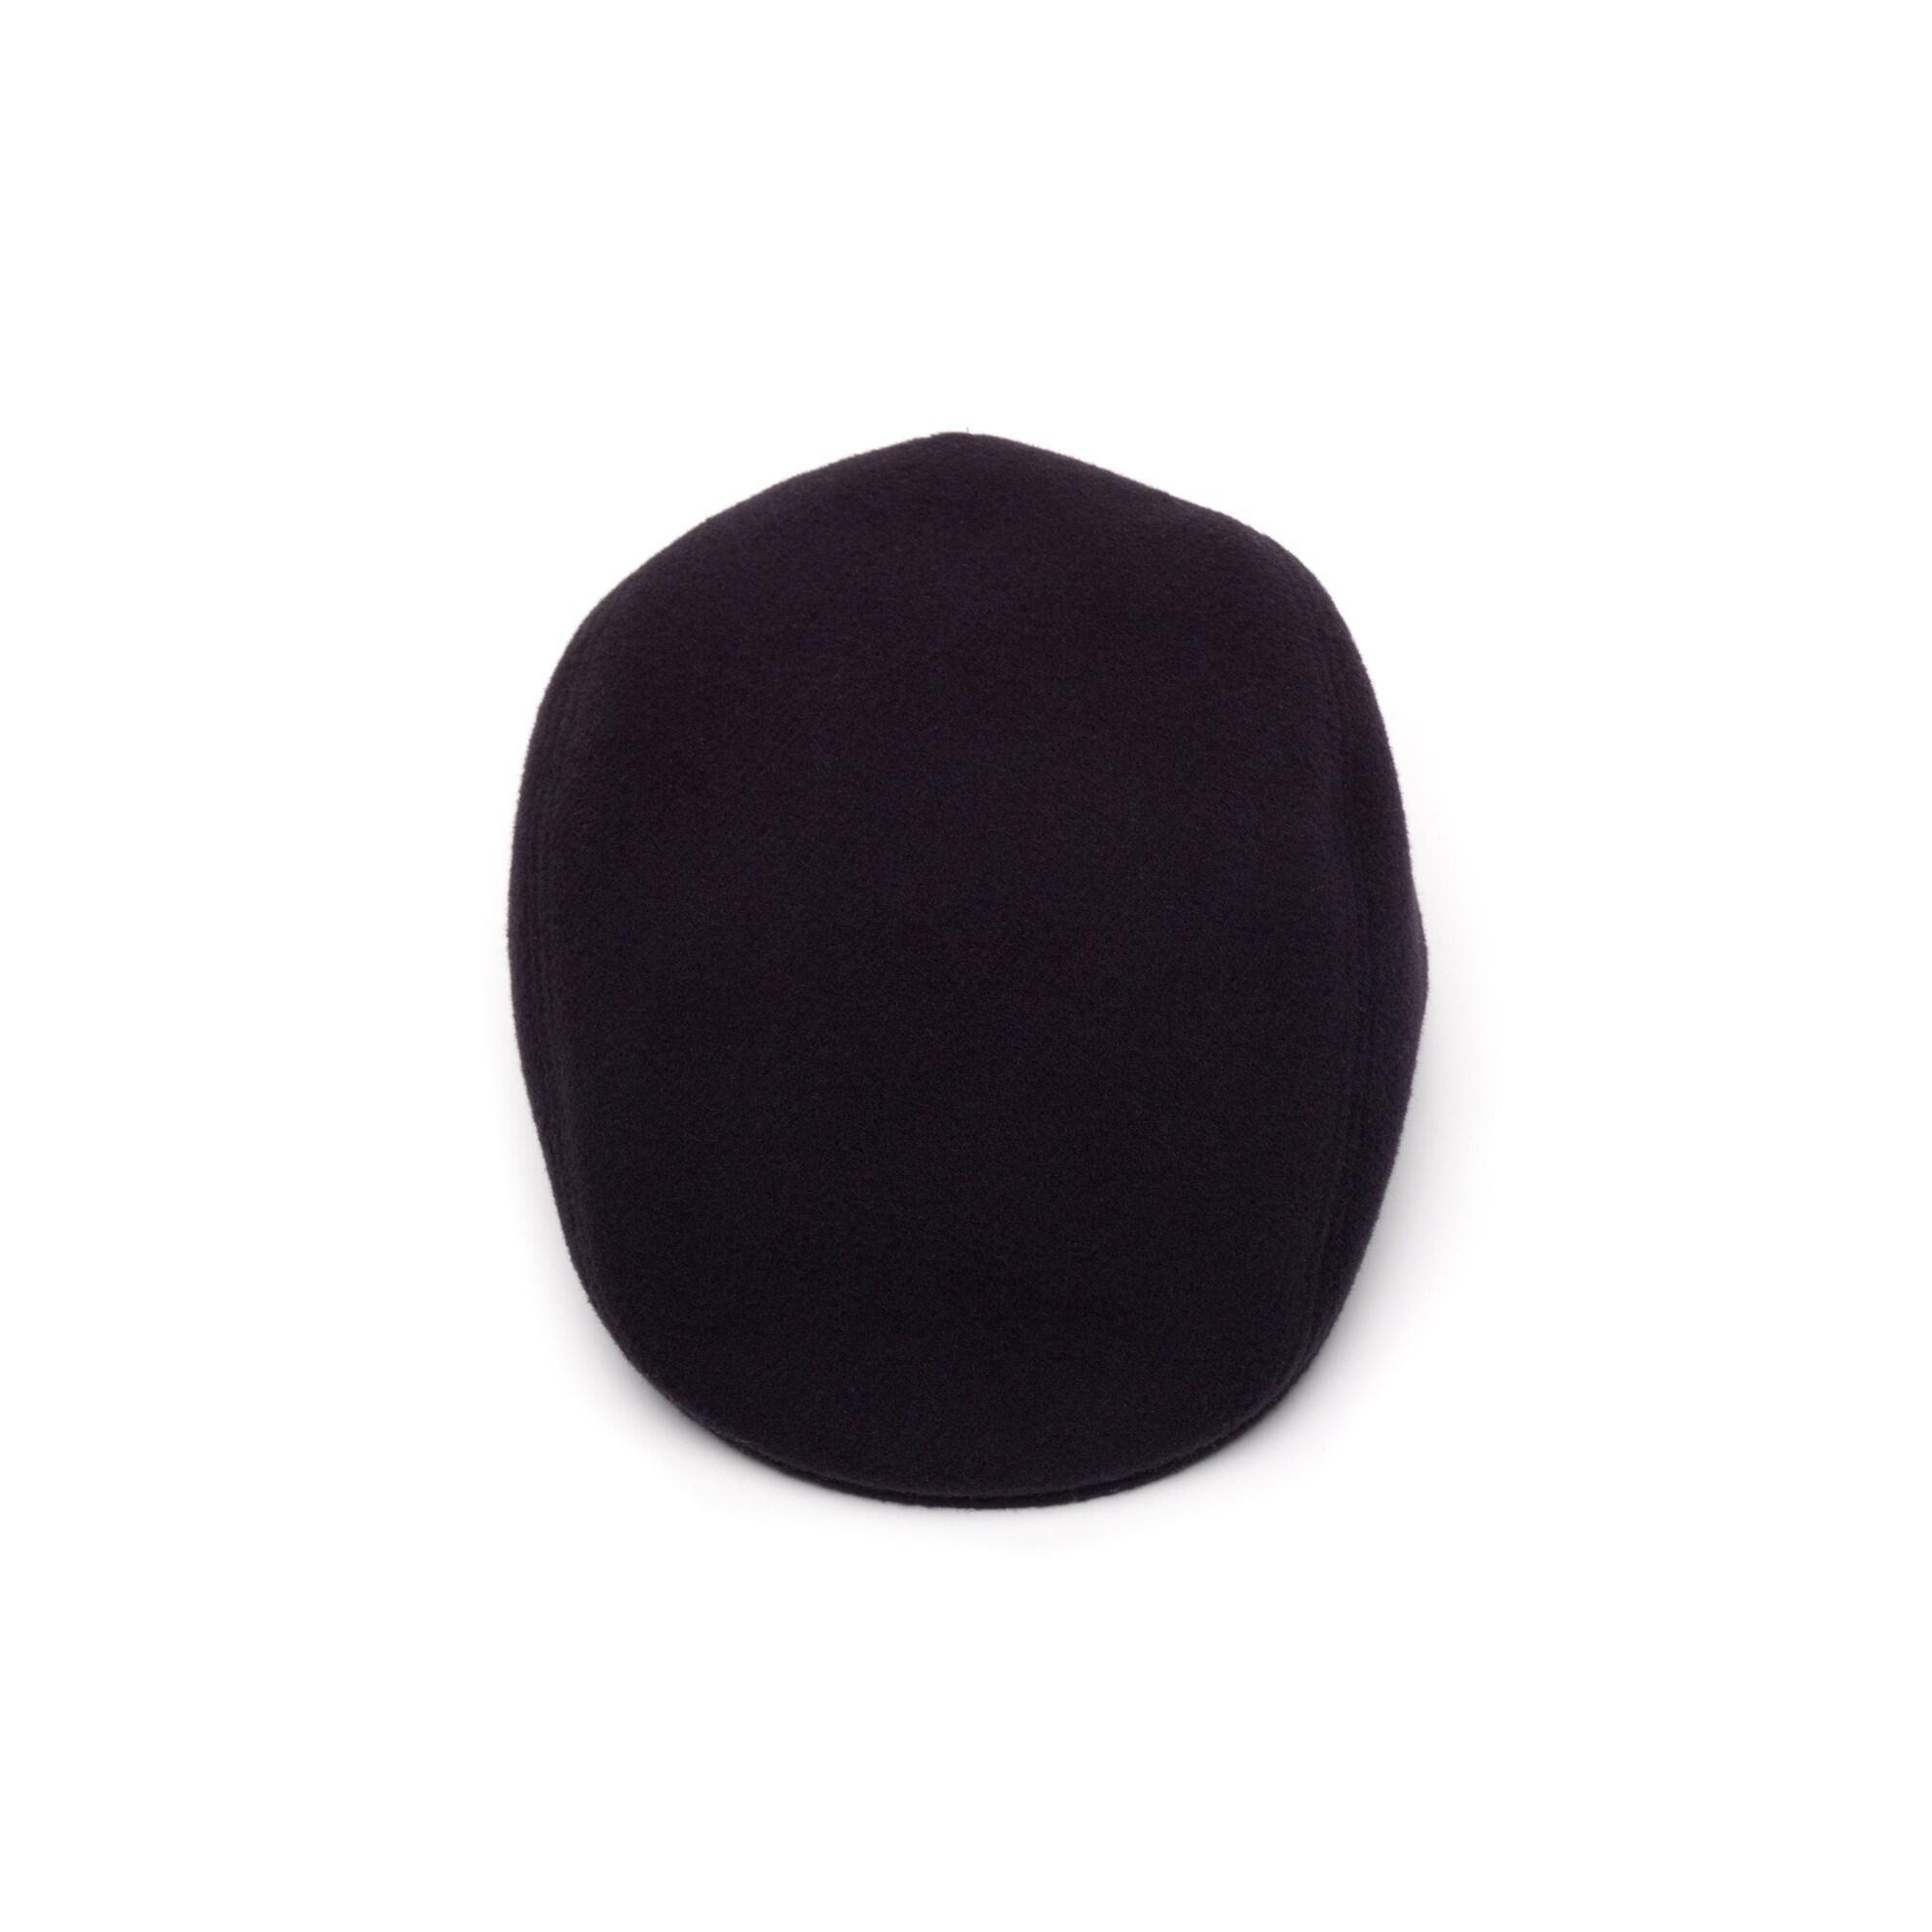 Lacoste Unisex Siyah Bere